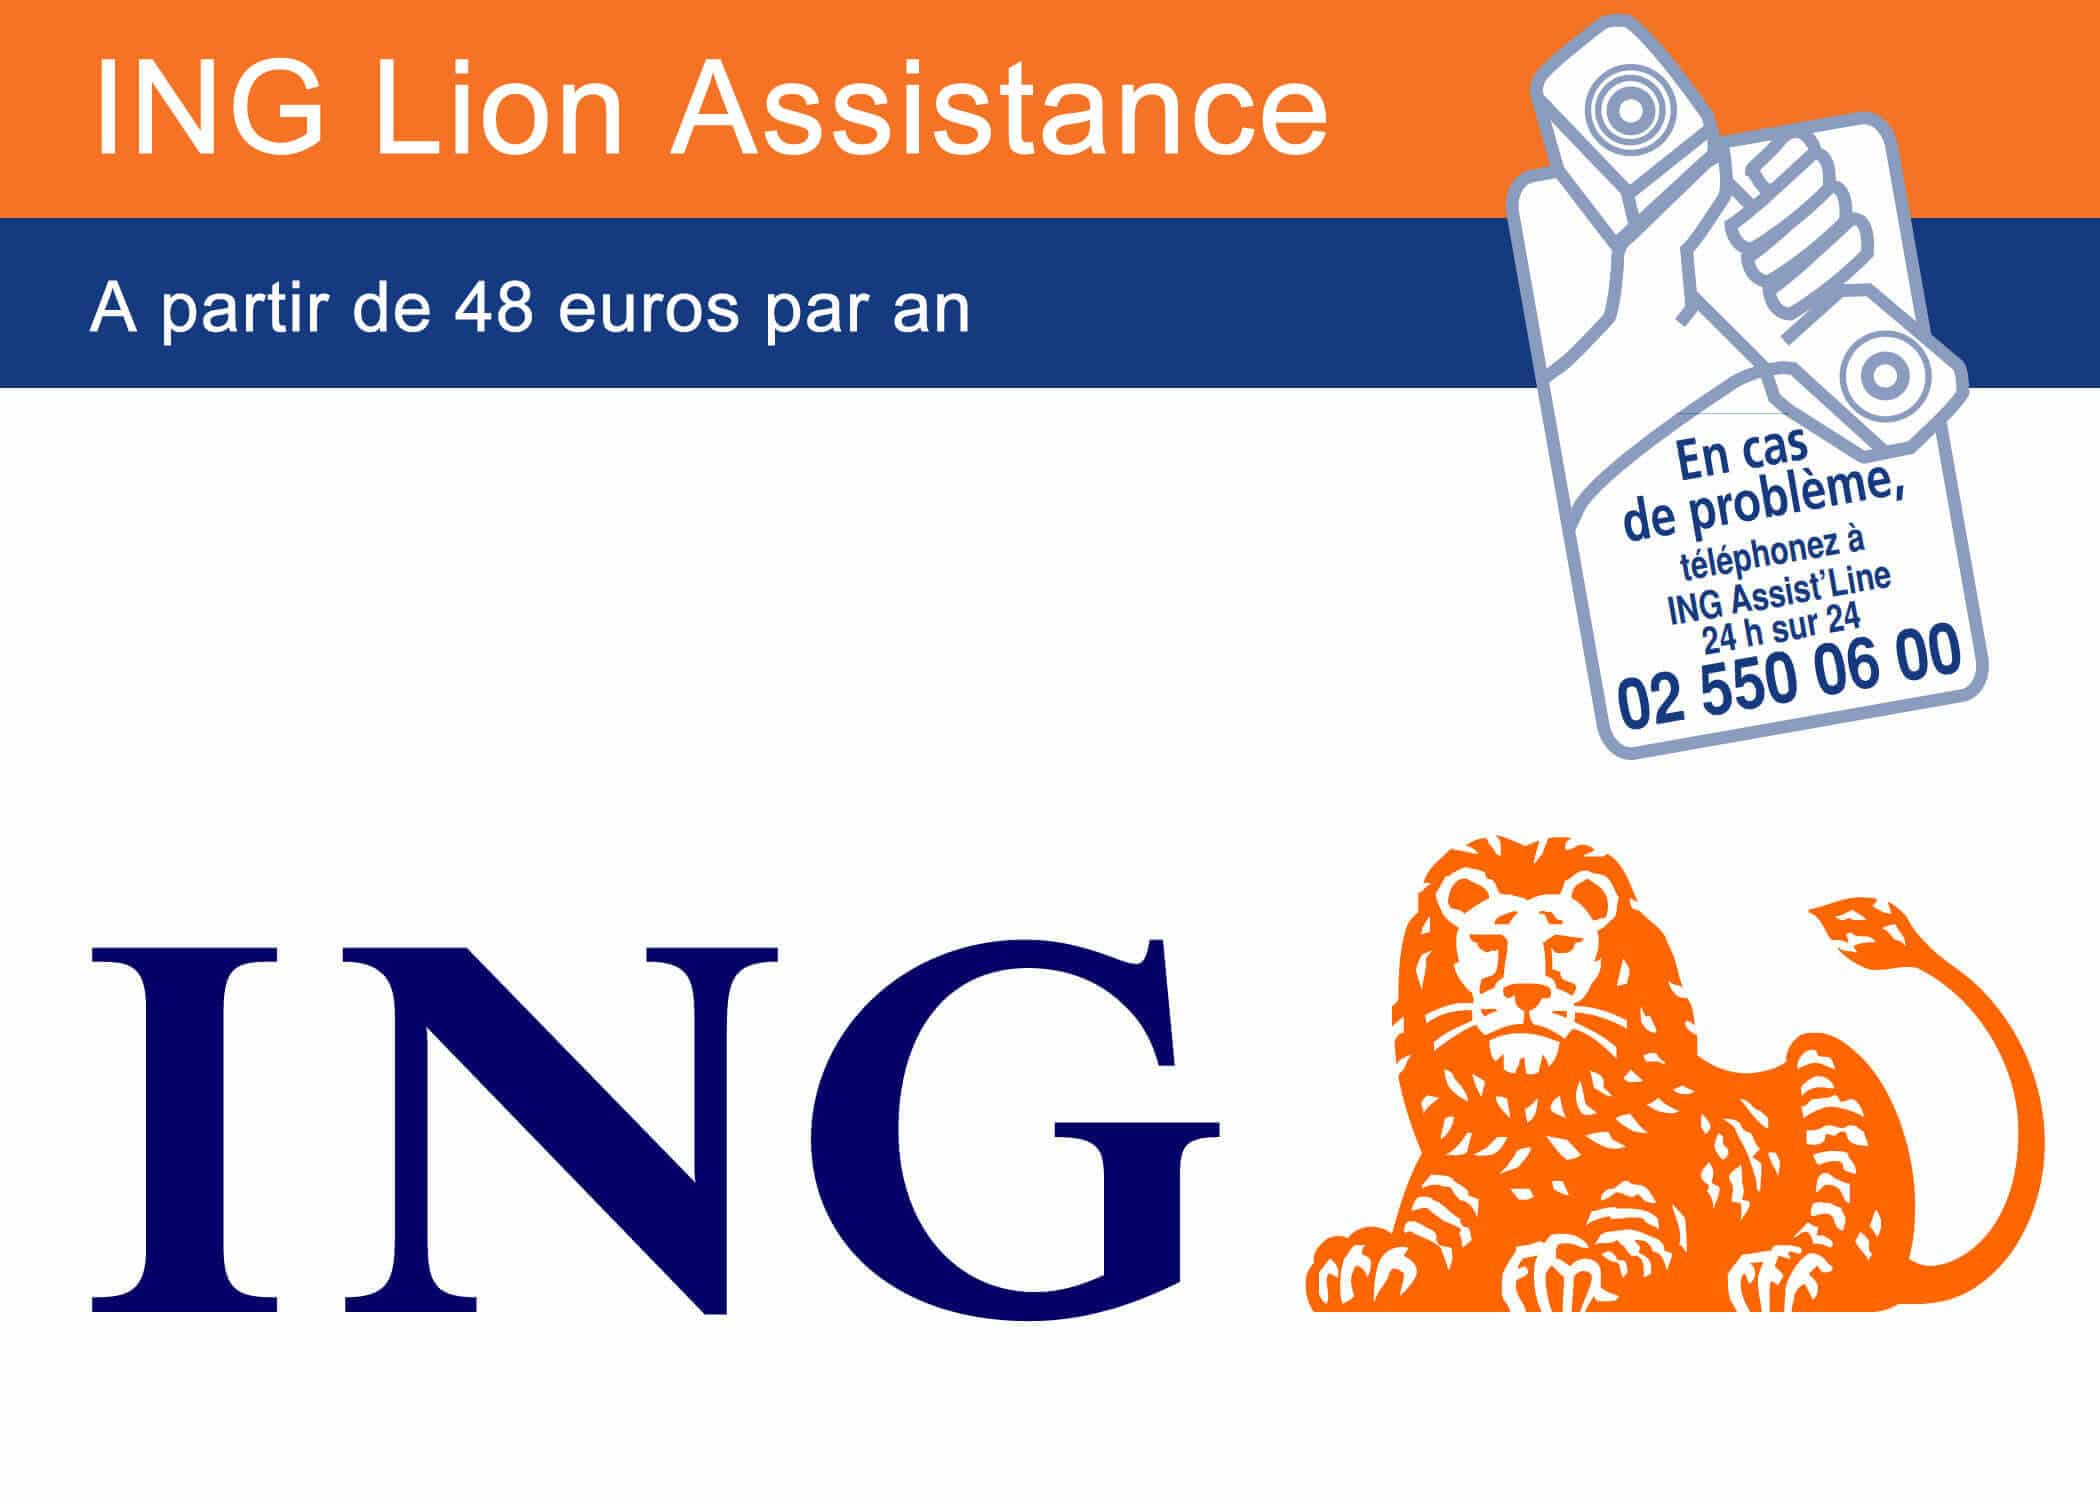 ING assistance à partir de 48 euros par an